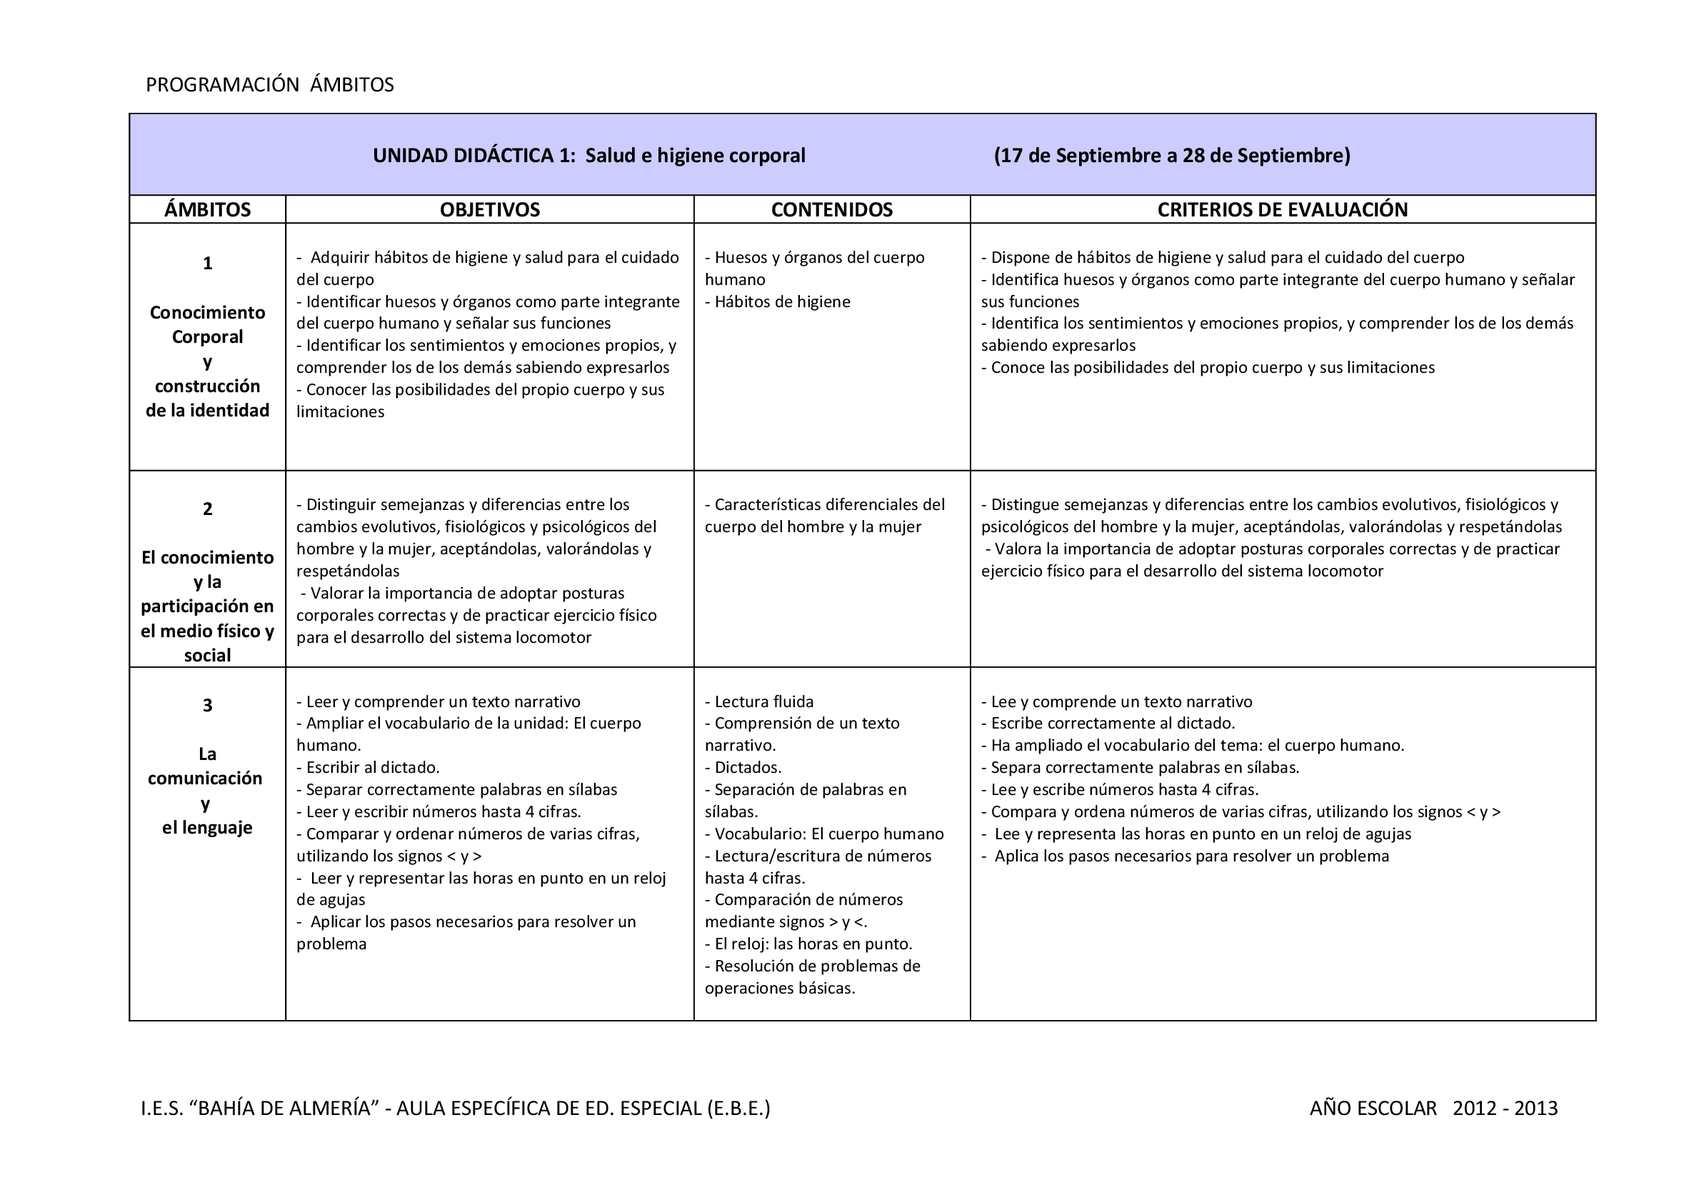 UUDD Aula Específica 2012-2013